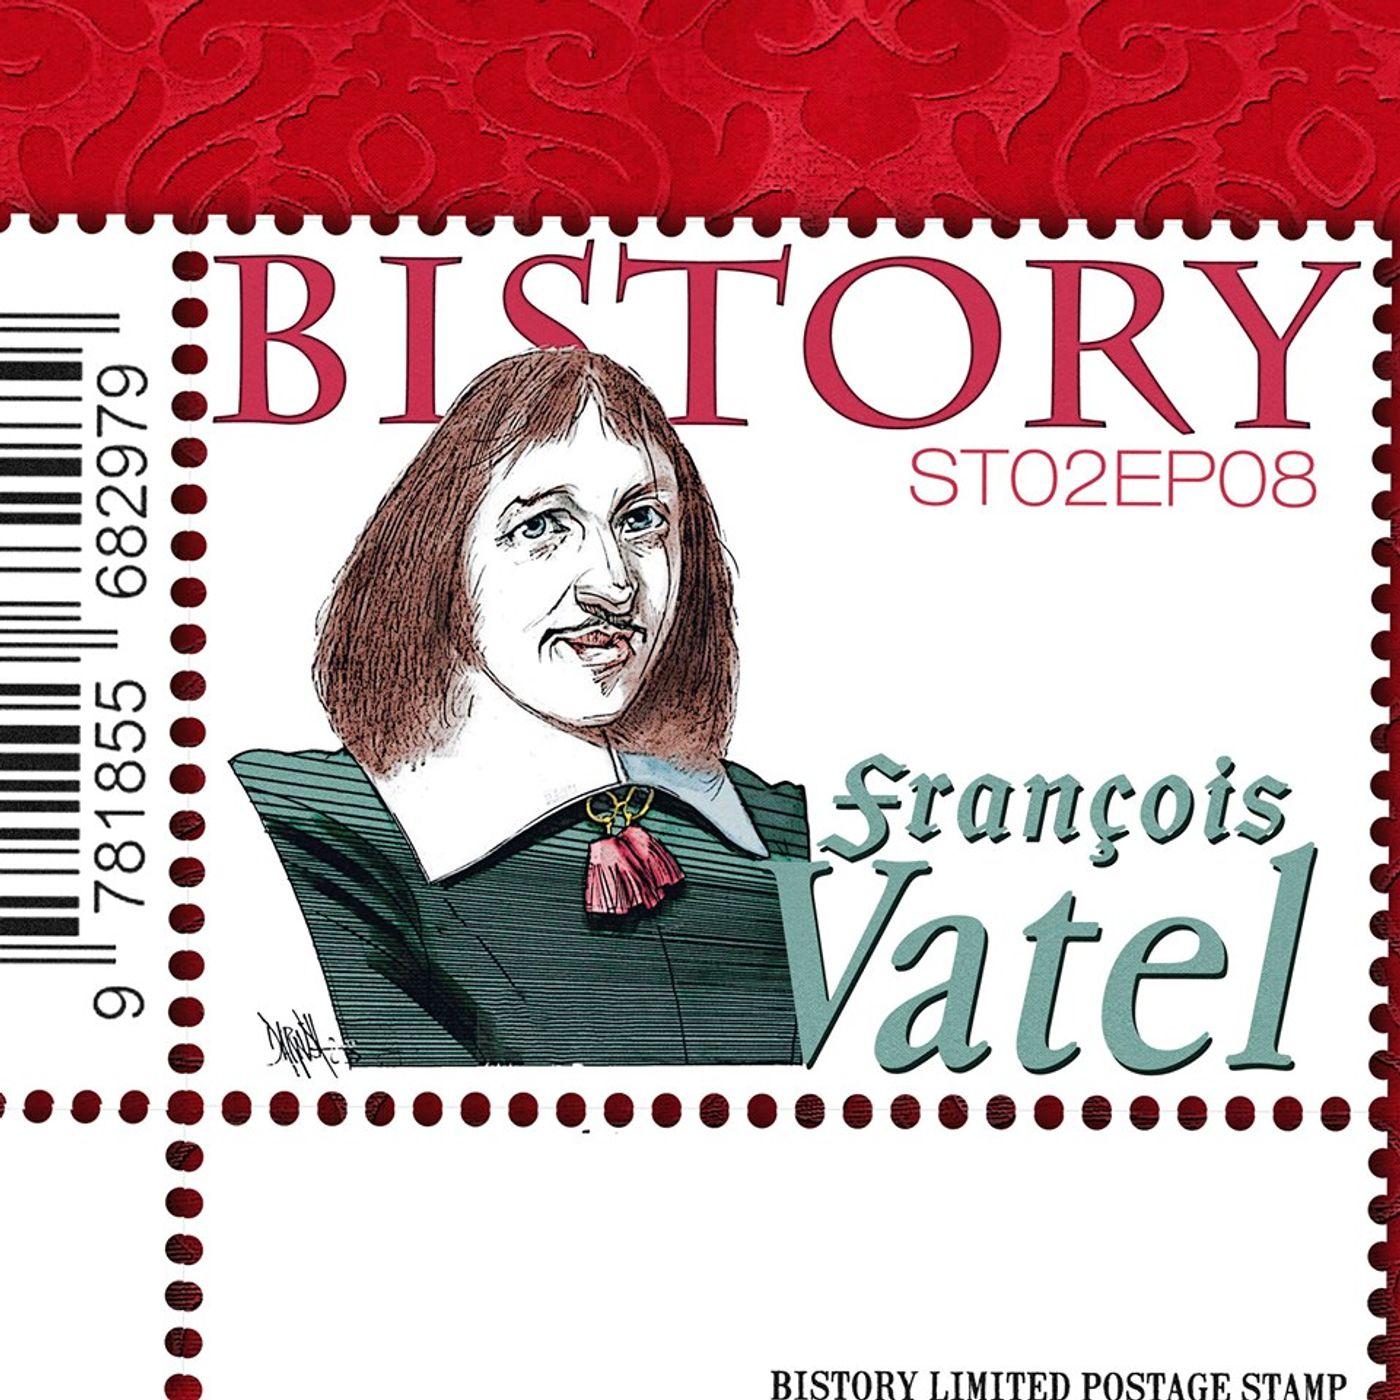 Bistory S02E08 Francois Vatel